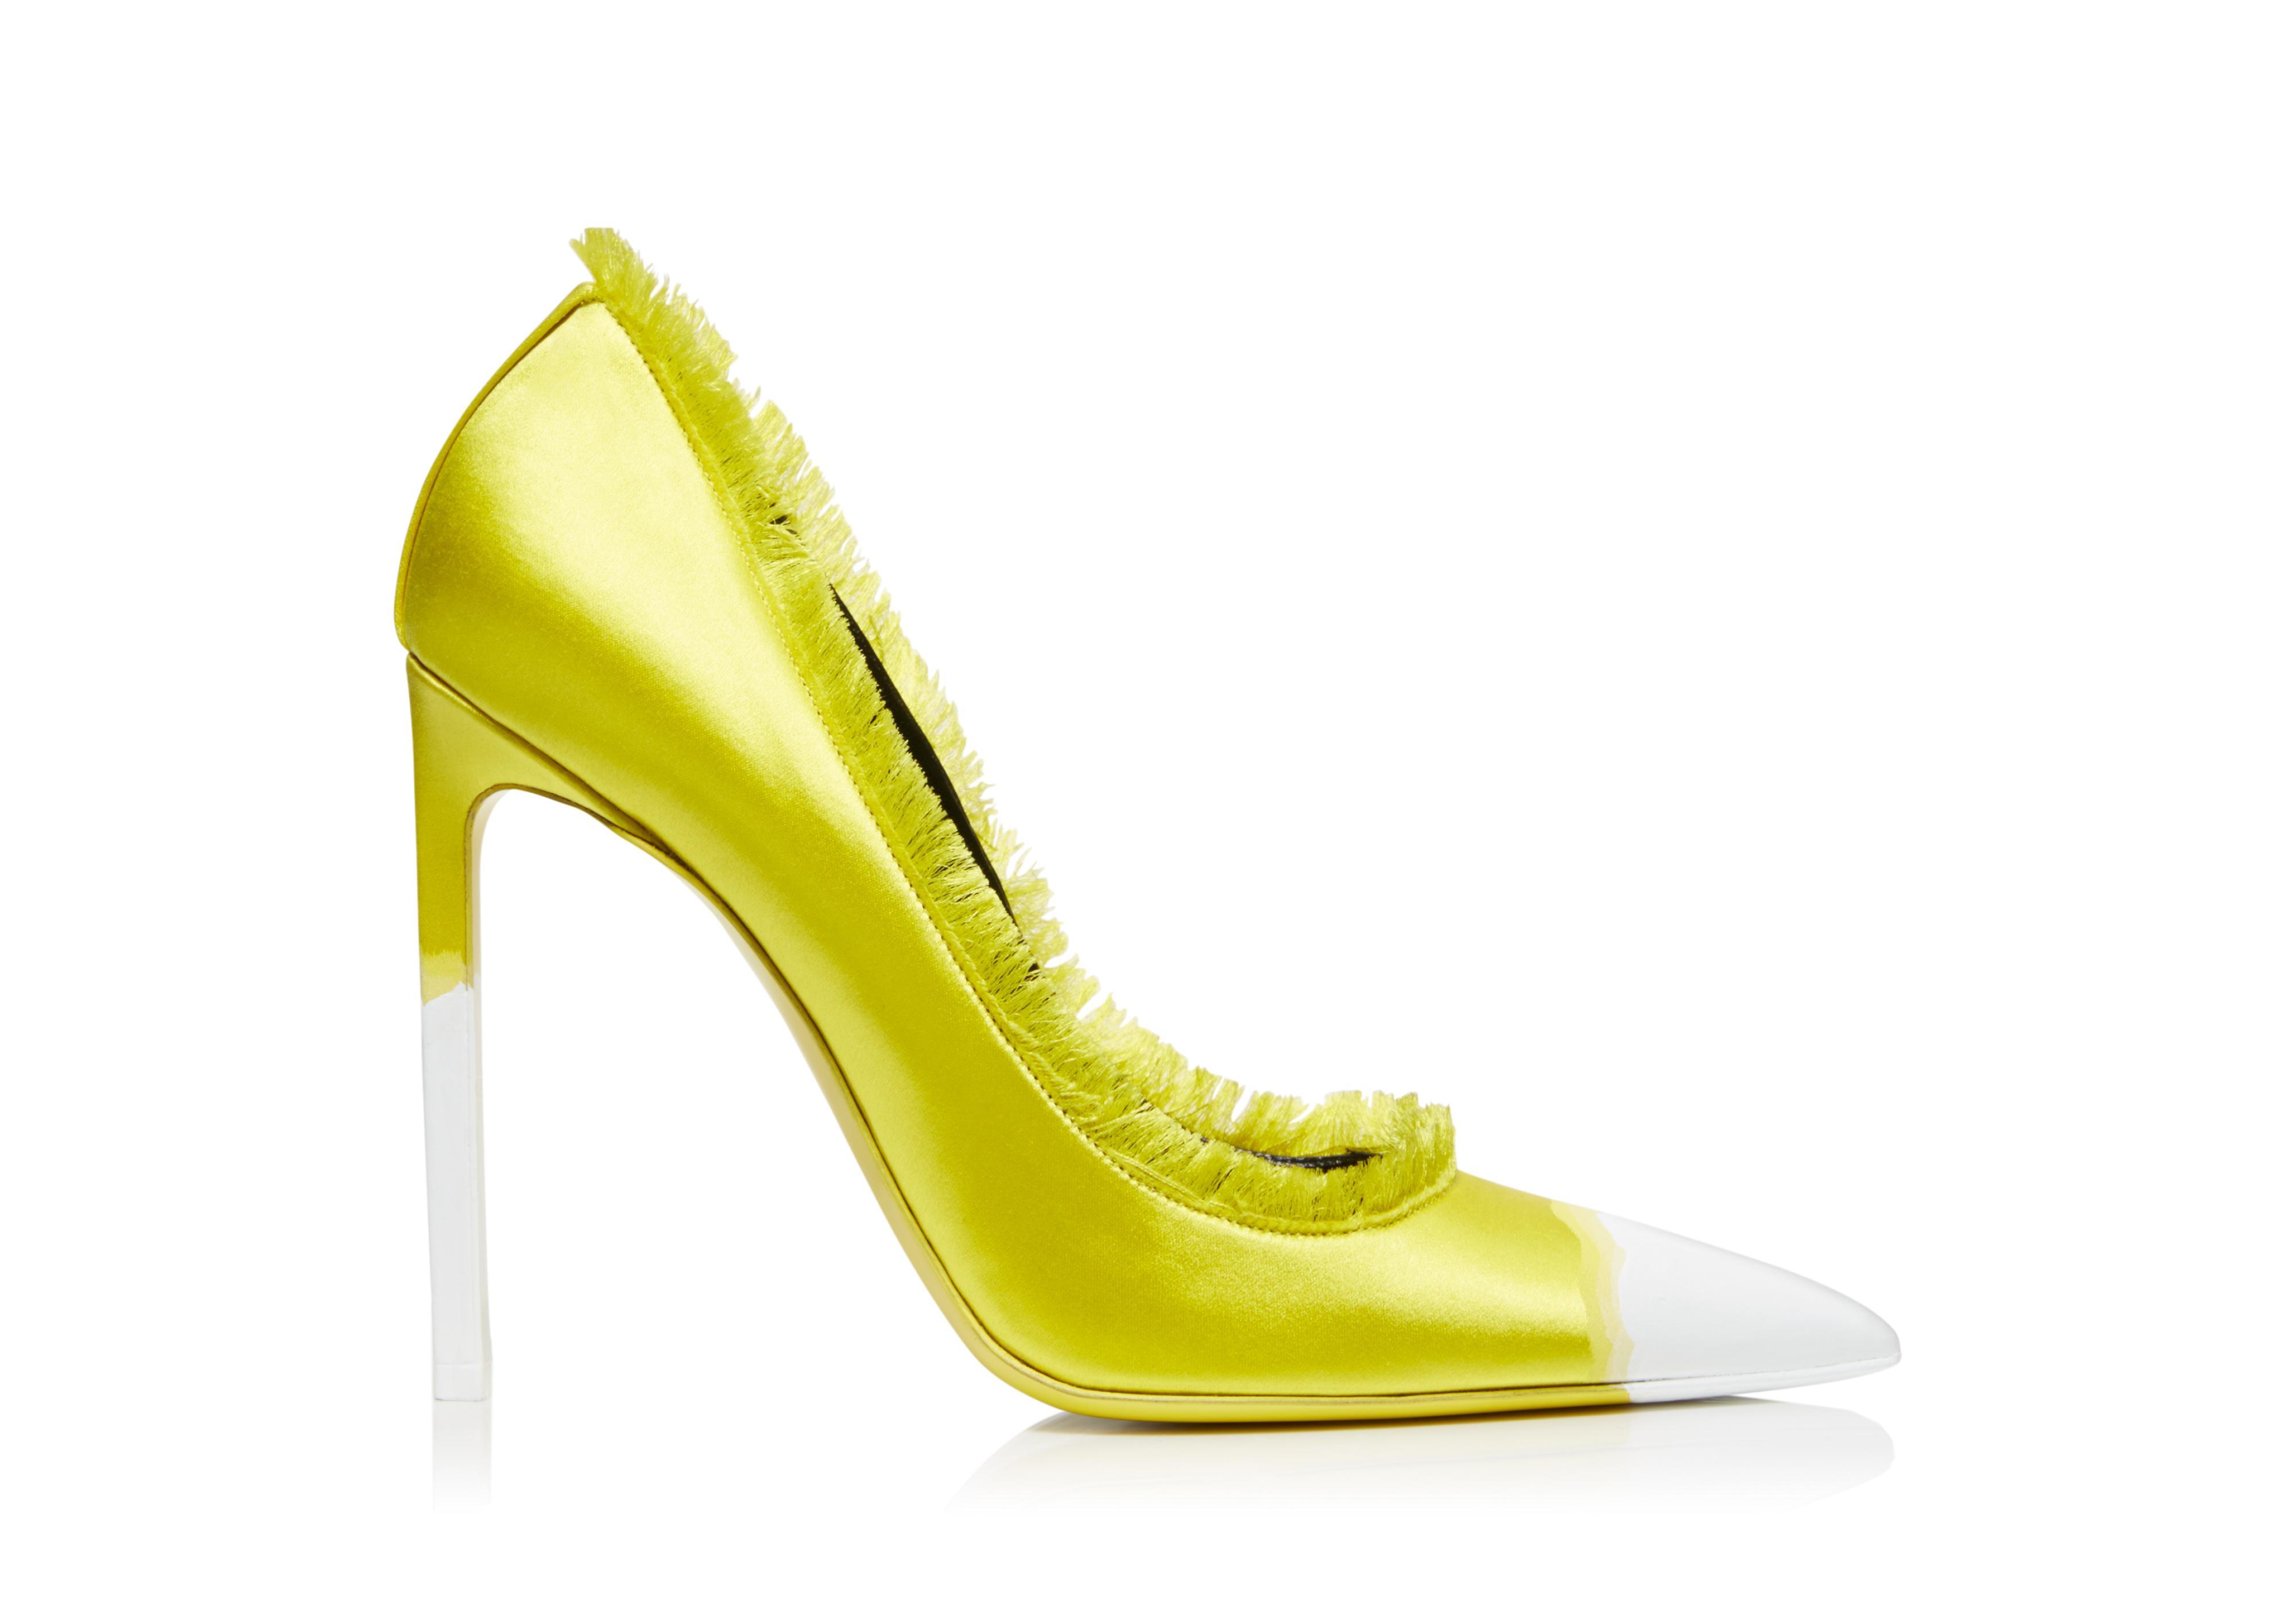 summer spring tfo fashion tom tag det trend ny september york ford mintmoda new forecasting heels archives week